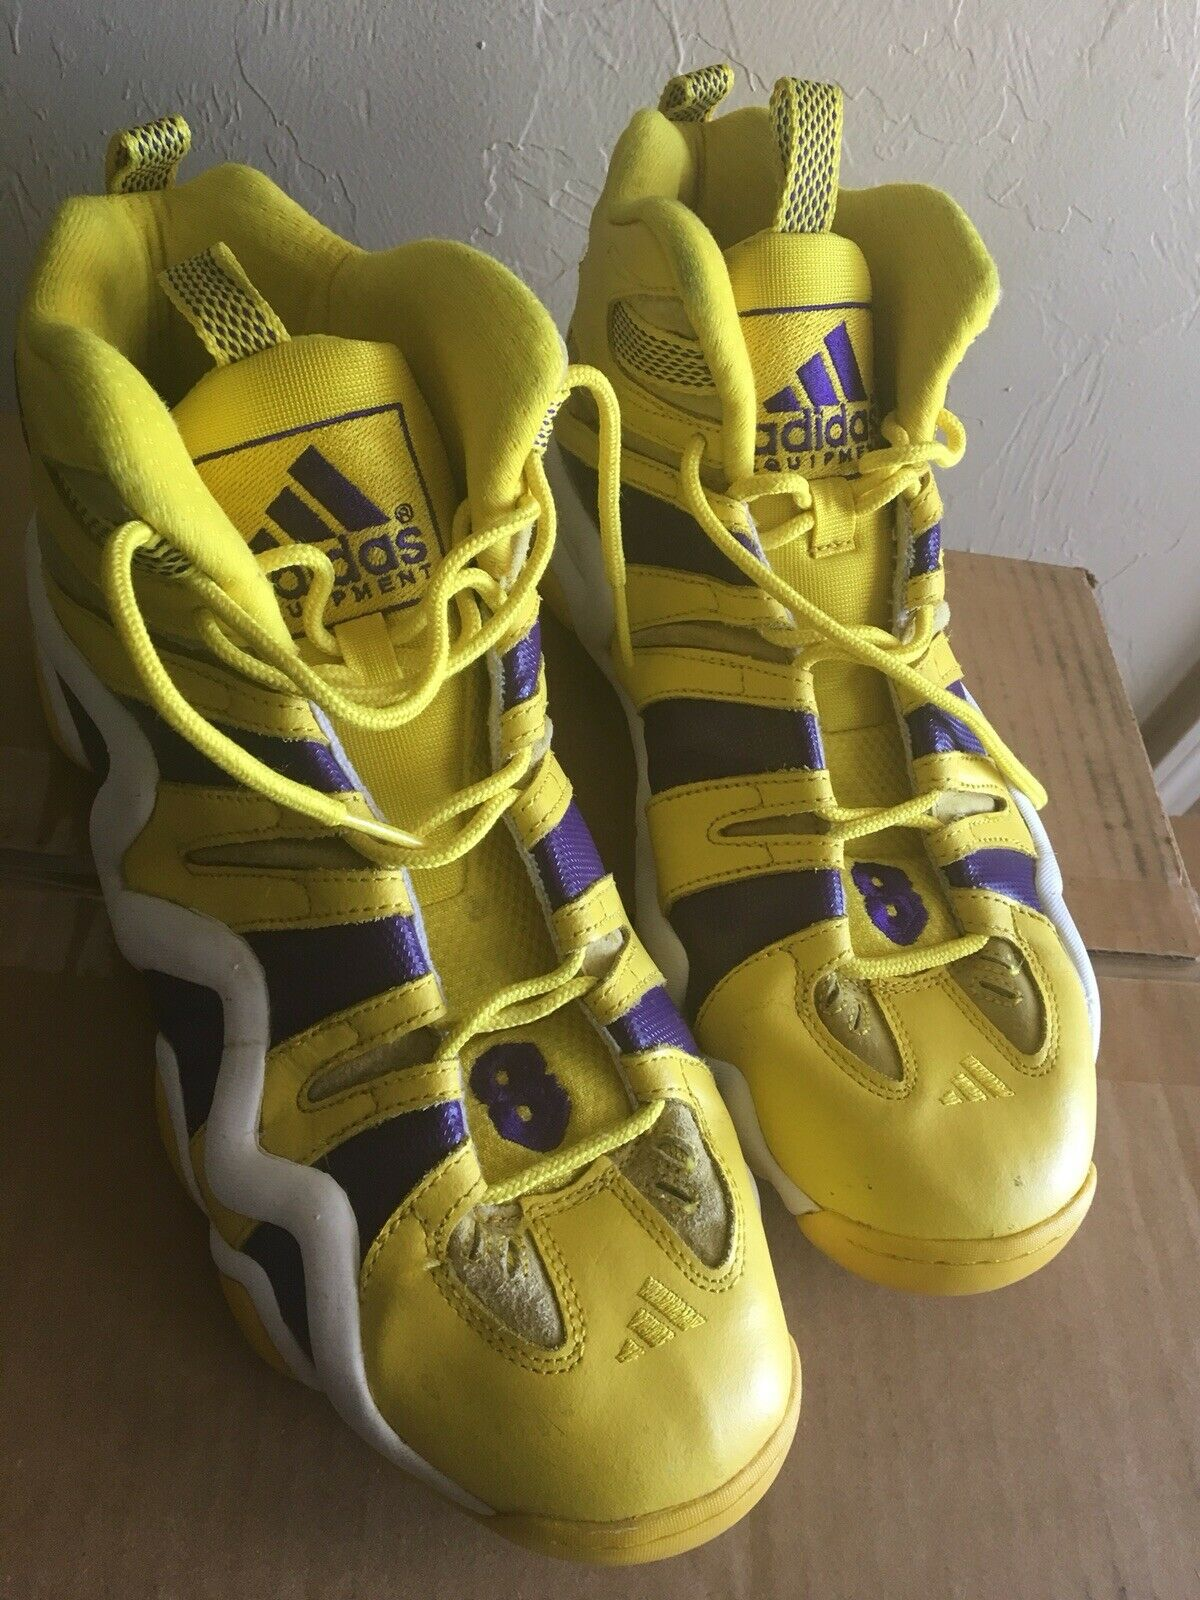 993c45a11 ADIDAS MEN S 9.5 ORIGINALS SOBAKOV SHOES AQ1135 BLACK WHITE GUM TAN. Rare  Adidas Crazy 8 Yellow All Star PE Kobe Bryant Sz. 14 Lakers colorway No